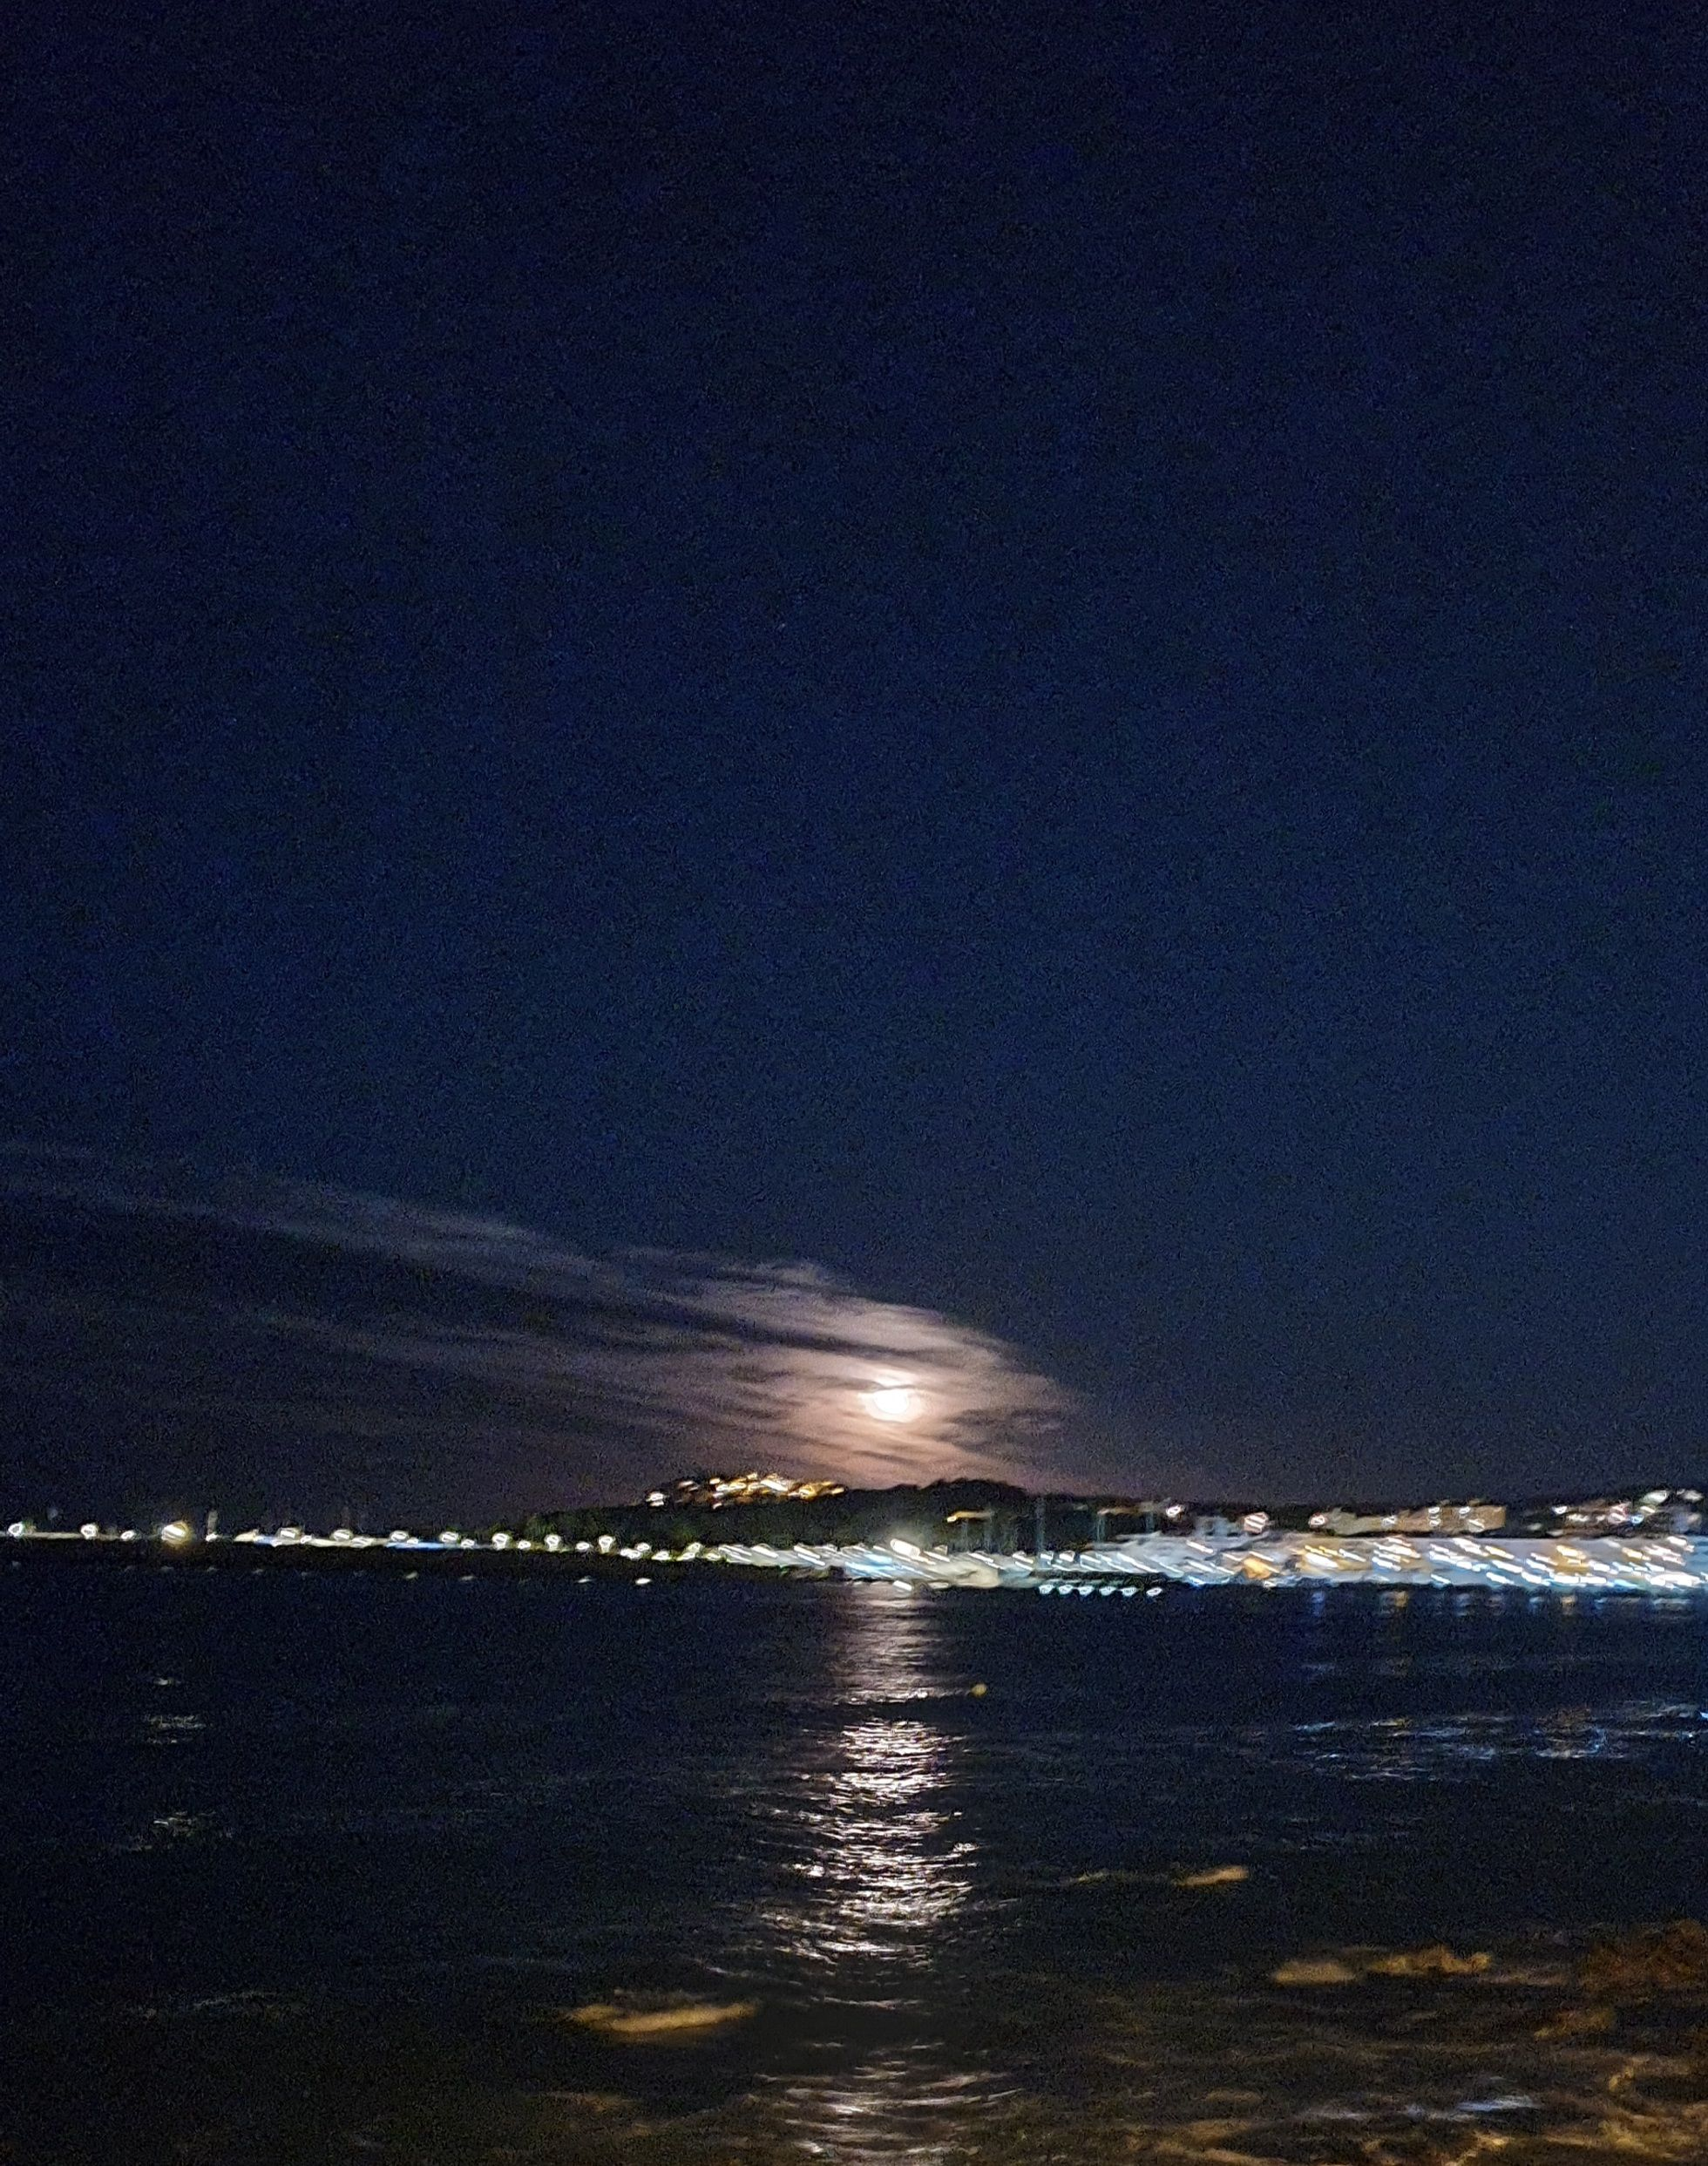 blue moon L 'Escala#Sonia Pindado Rodríguez 134